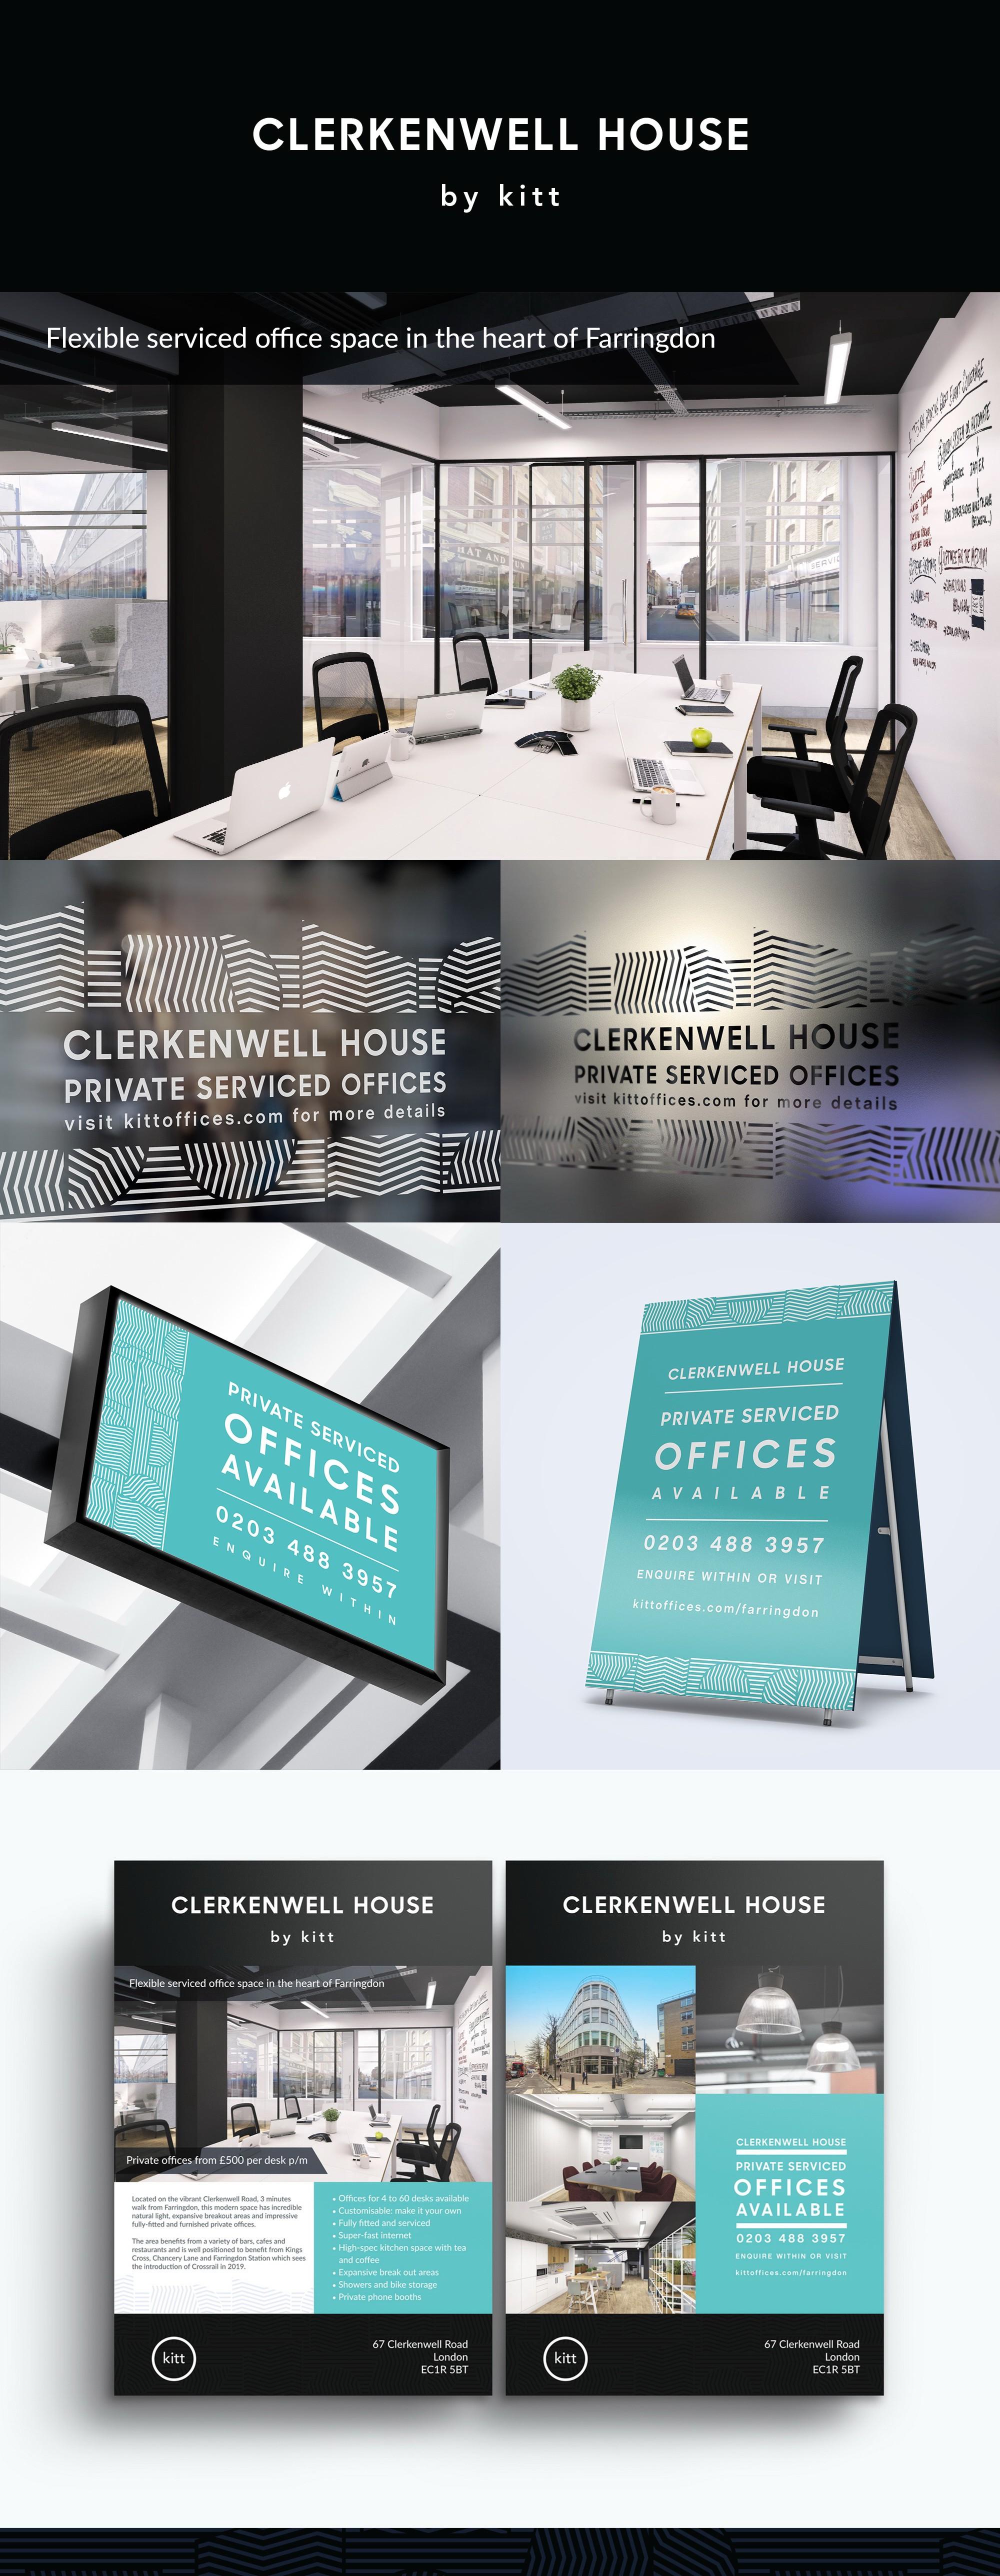 Window vinyl advertising serviced office space